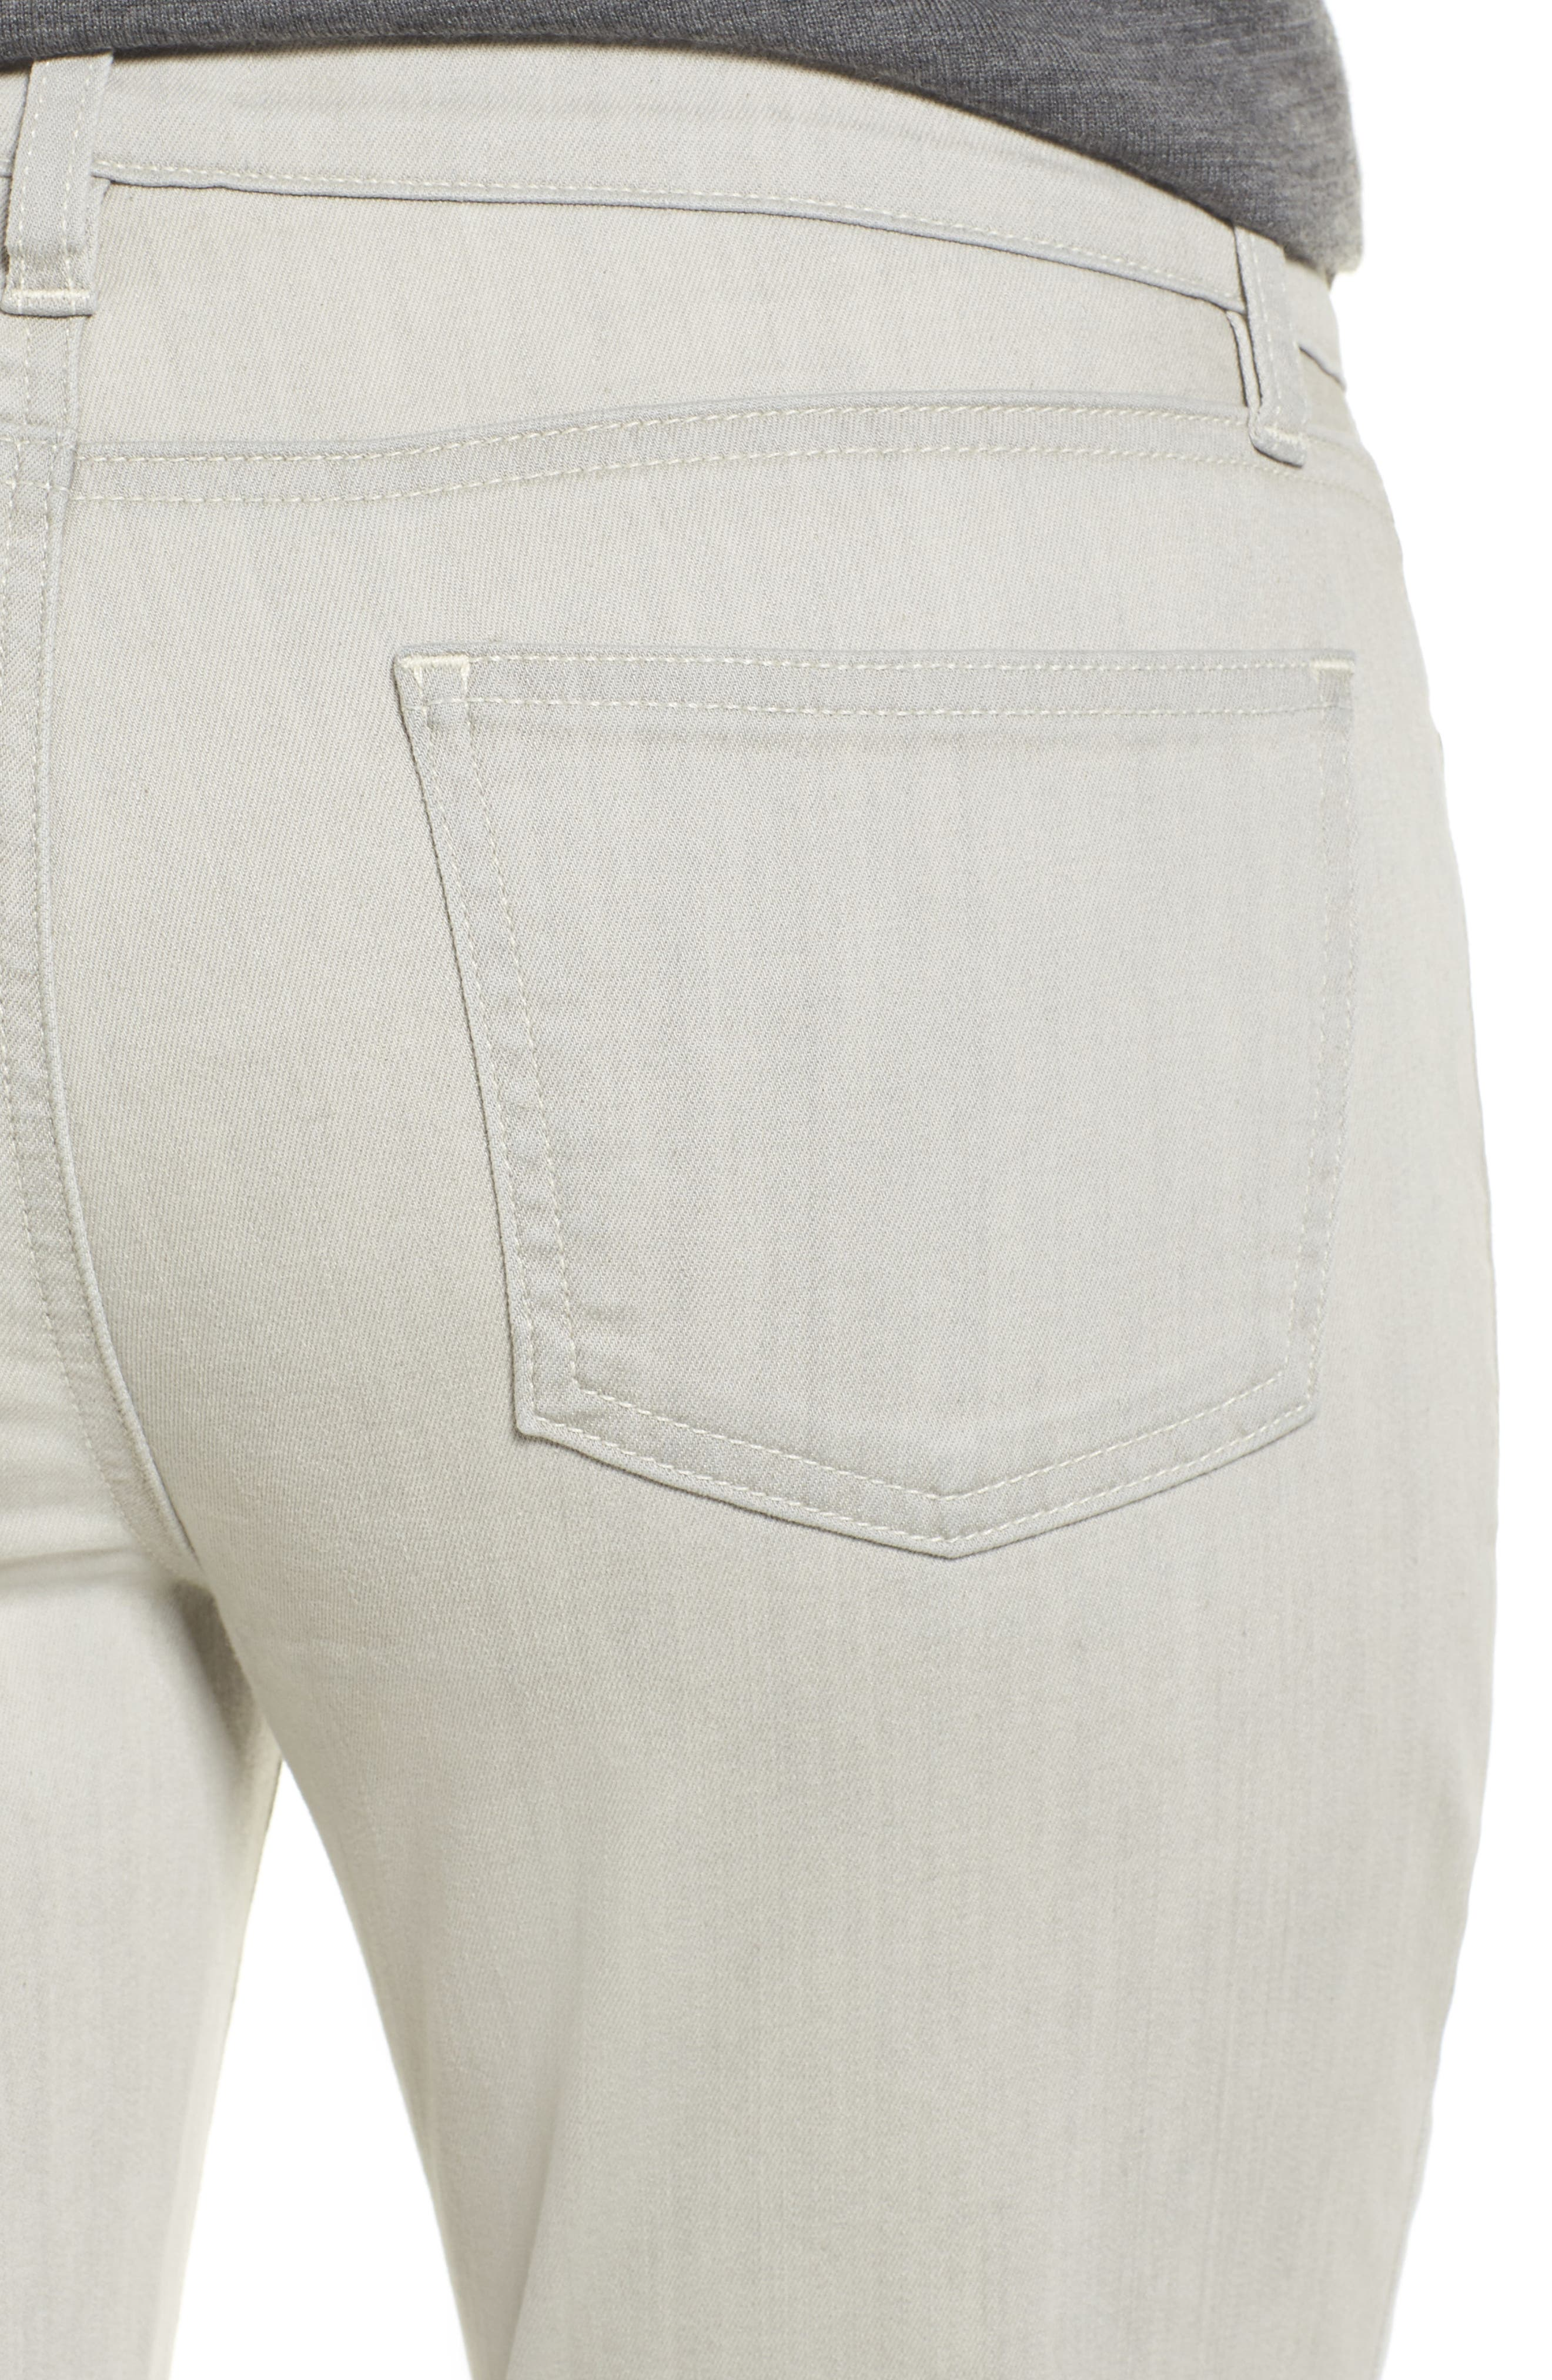 Slim Stretch Ankle Jeans,                             Alternate thumbnail 4, color,                             CEMENT